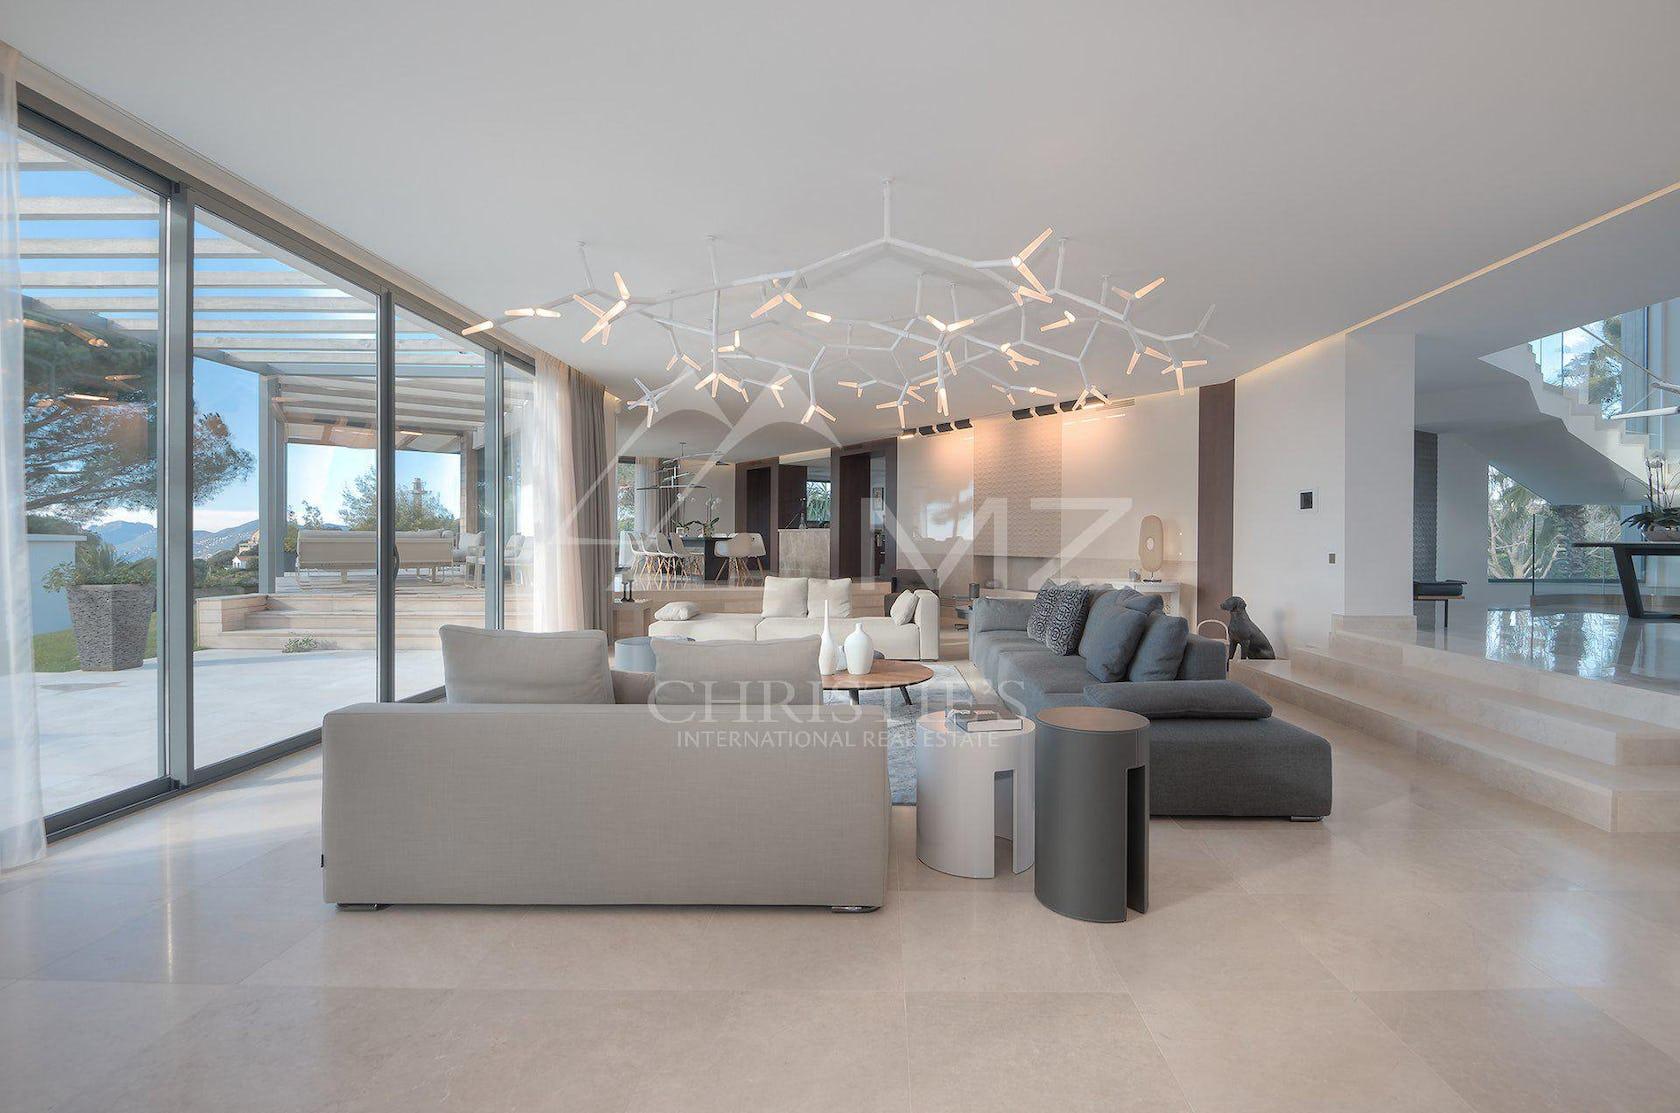 furniture flooring living room room indoors table interior design floor couch reception